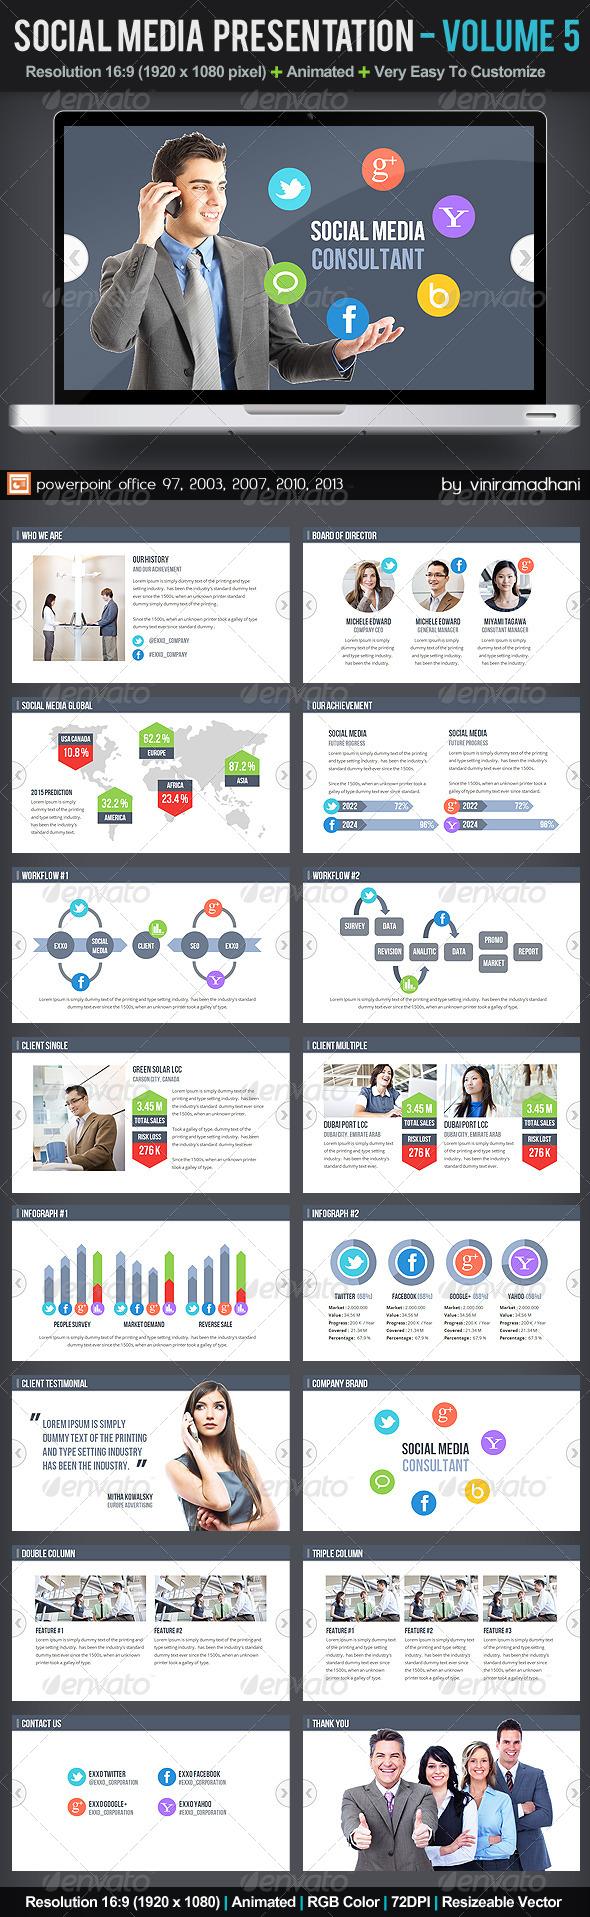 GraphicRiver Social Media Presentation Volume 5 5898242